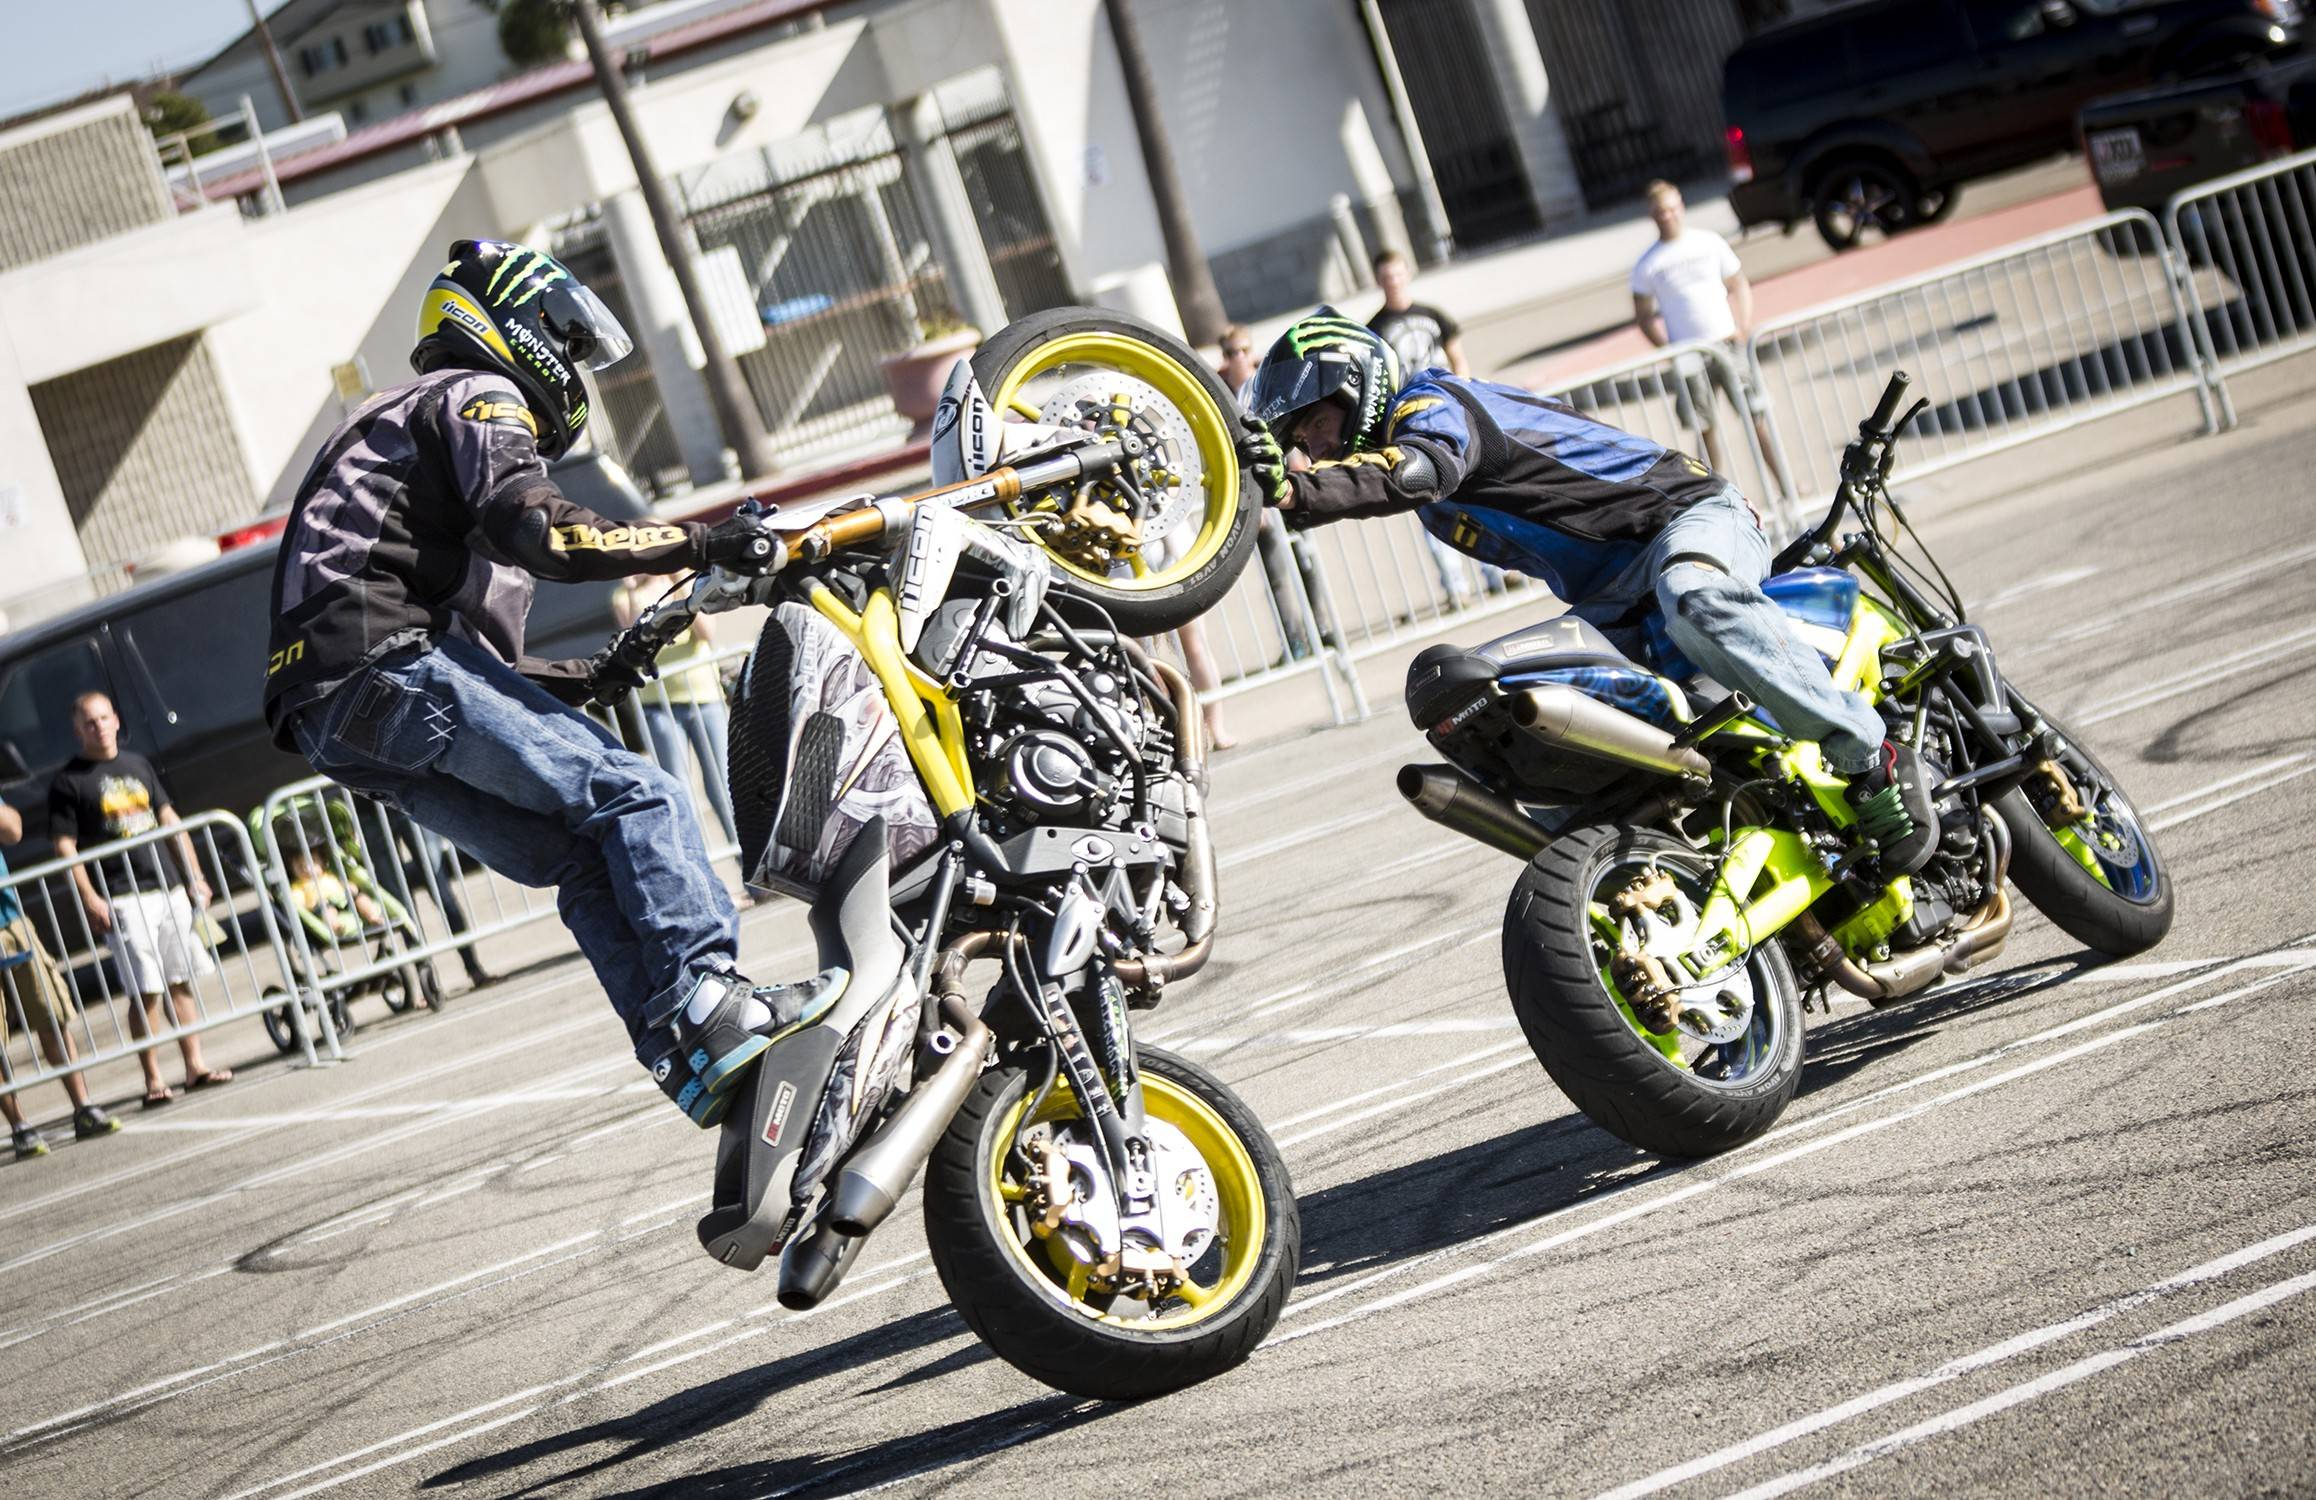 Fabricaciop R15 Bike Stunts Wallpapers Hd